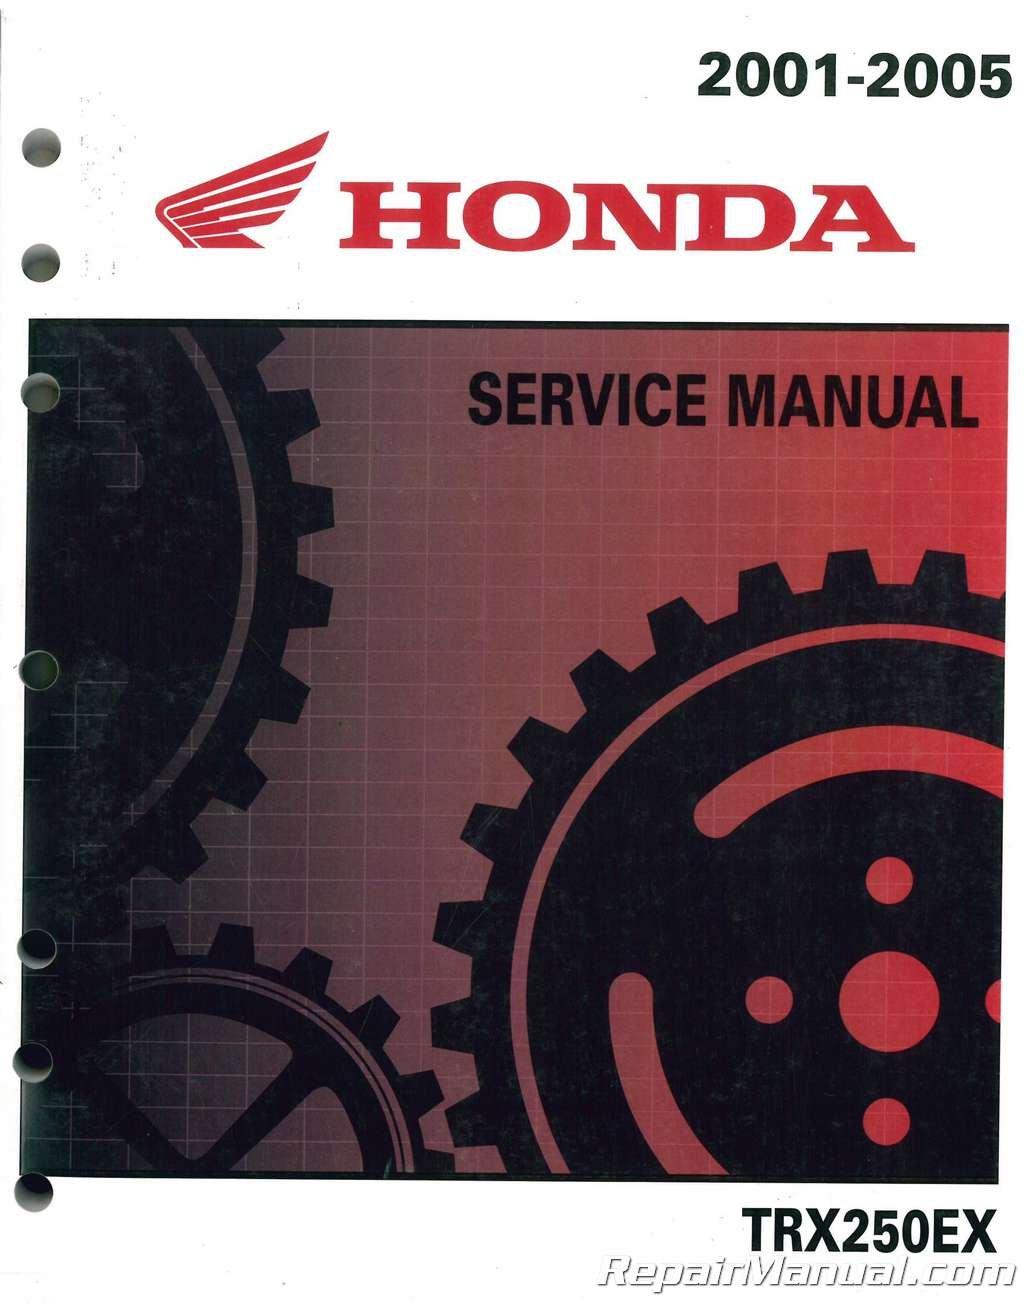 61HN604 2001-2005 Honda TRX250EX ATV Service Manual Paperback – 2004